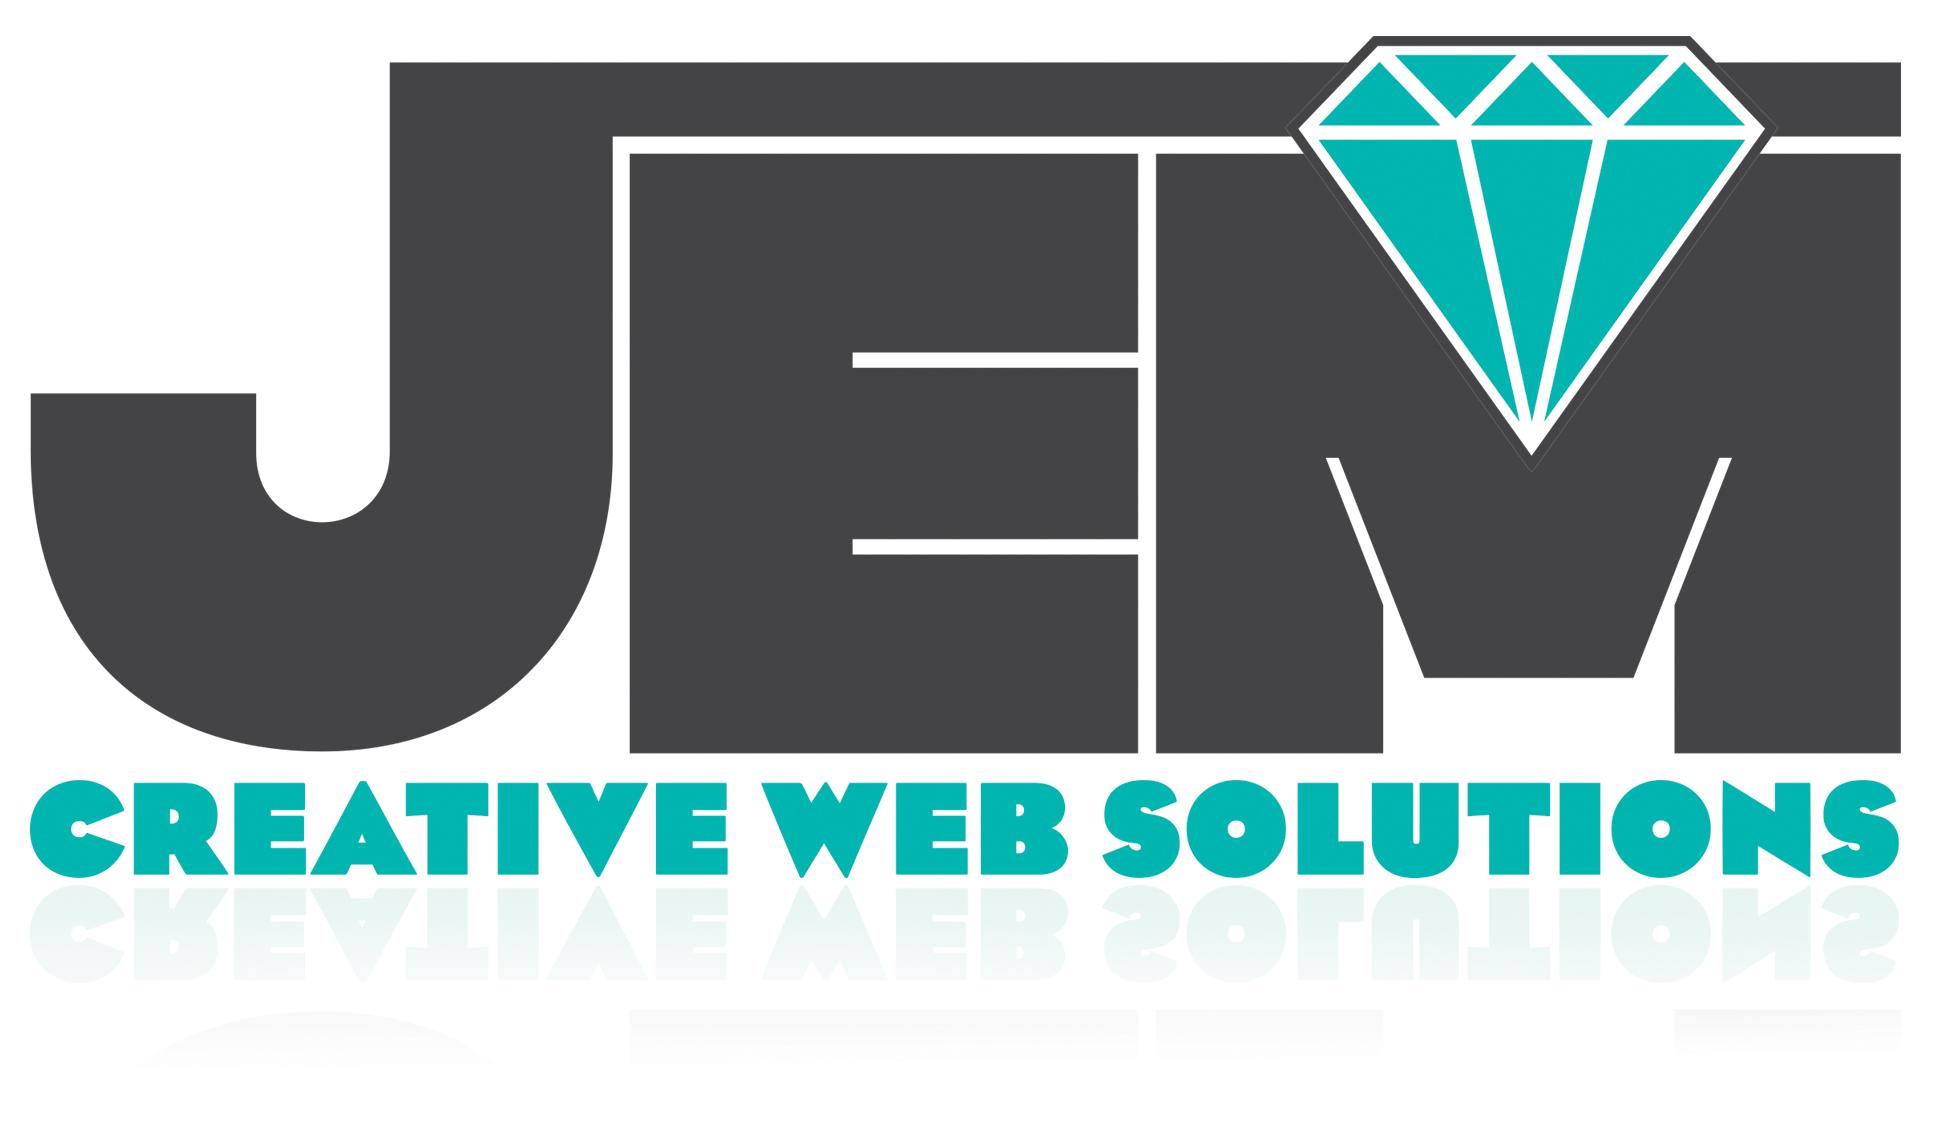 Jem Creative Web Solutions